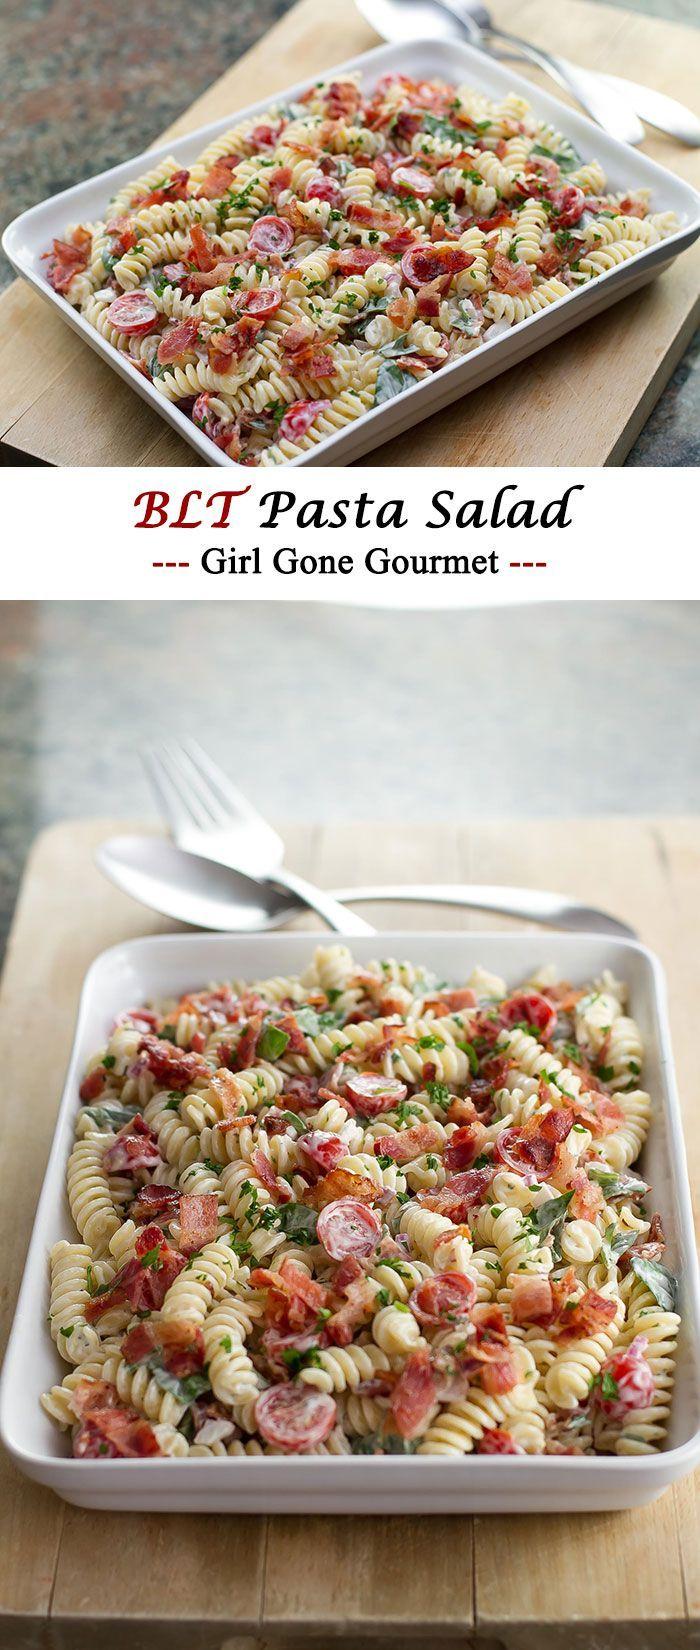 18 best Squash Board images on Pinterest   Kitchen recipes, Roast ...